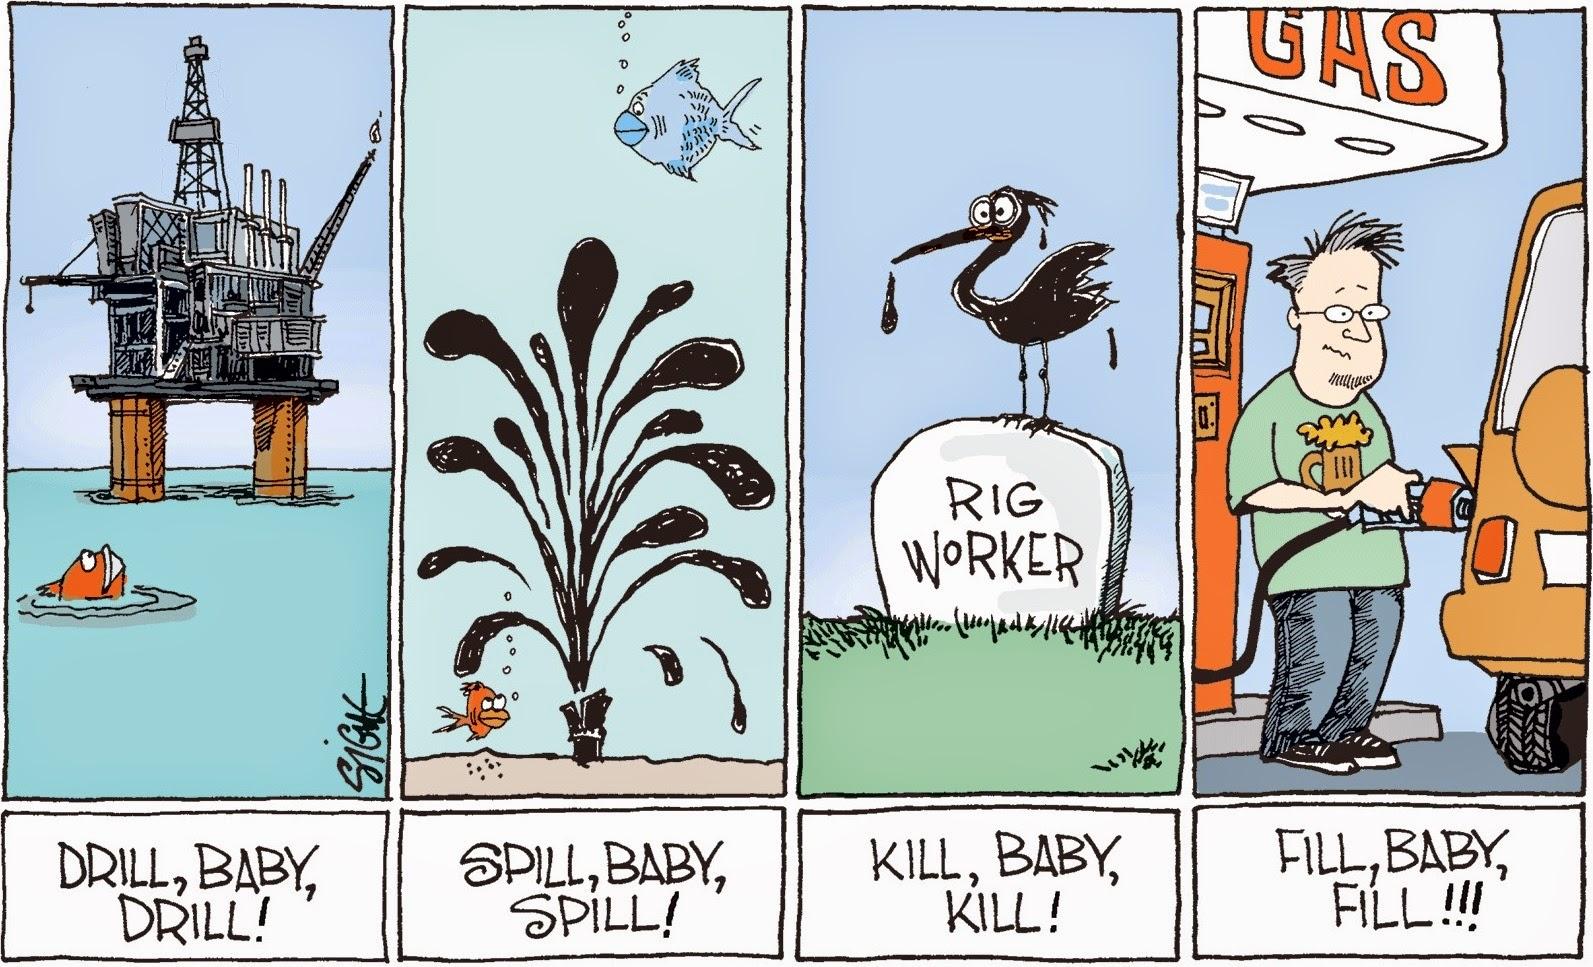 Signe Wilkinson: Fill, Baby, Fill!!!